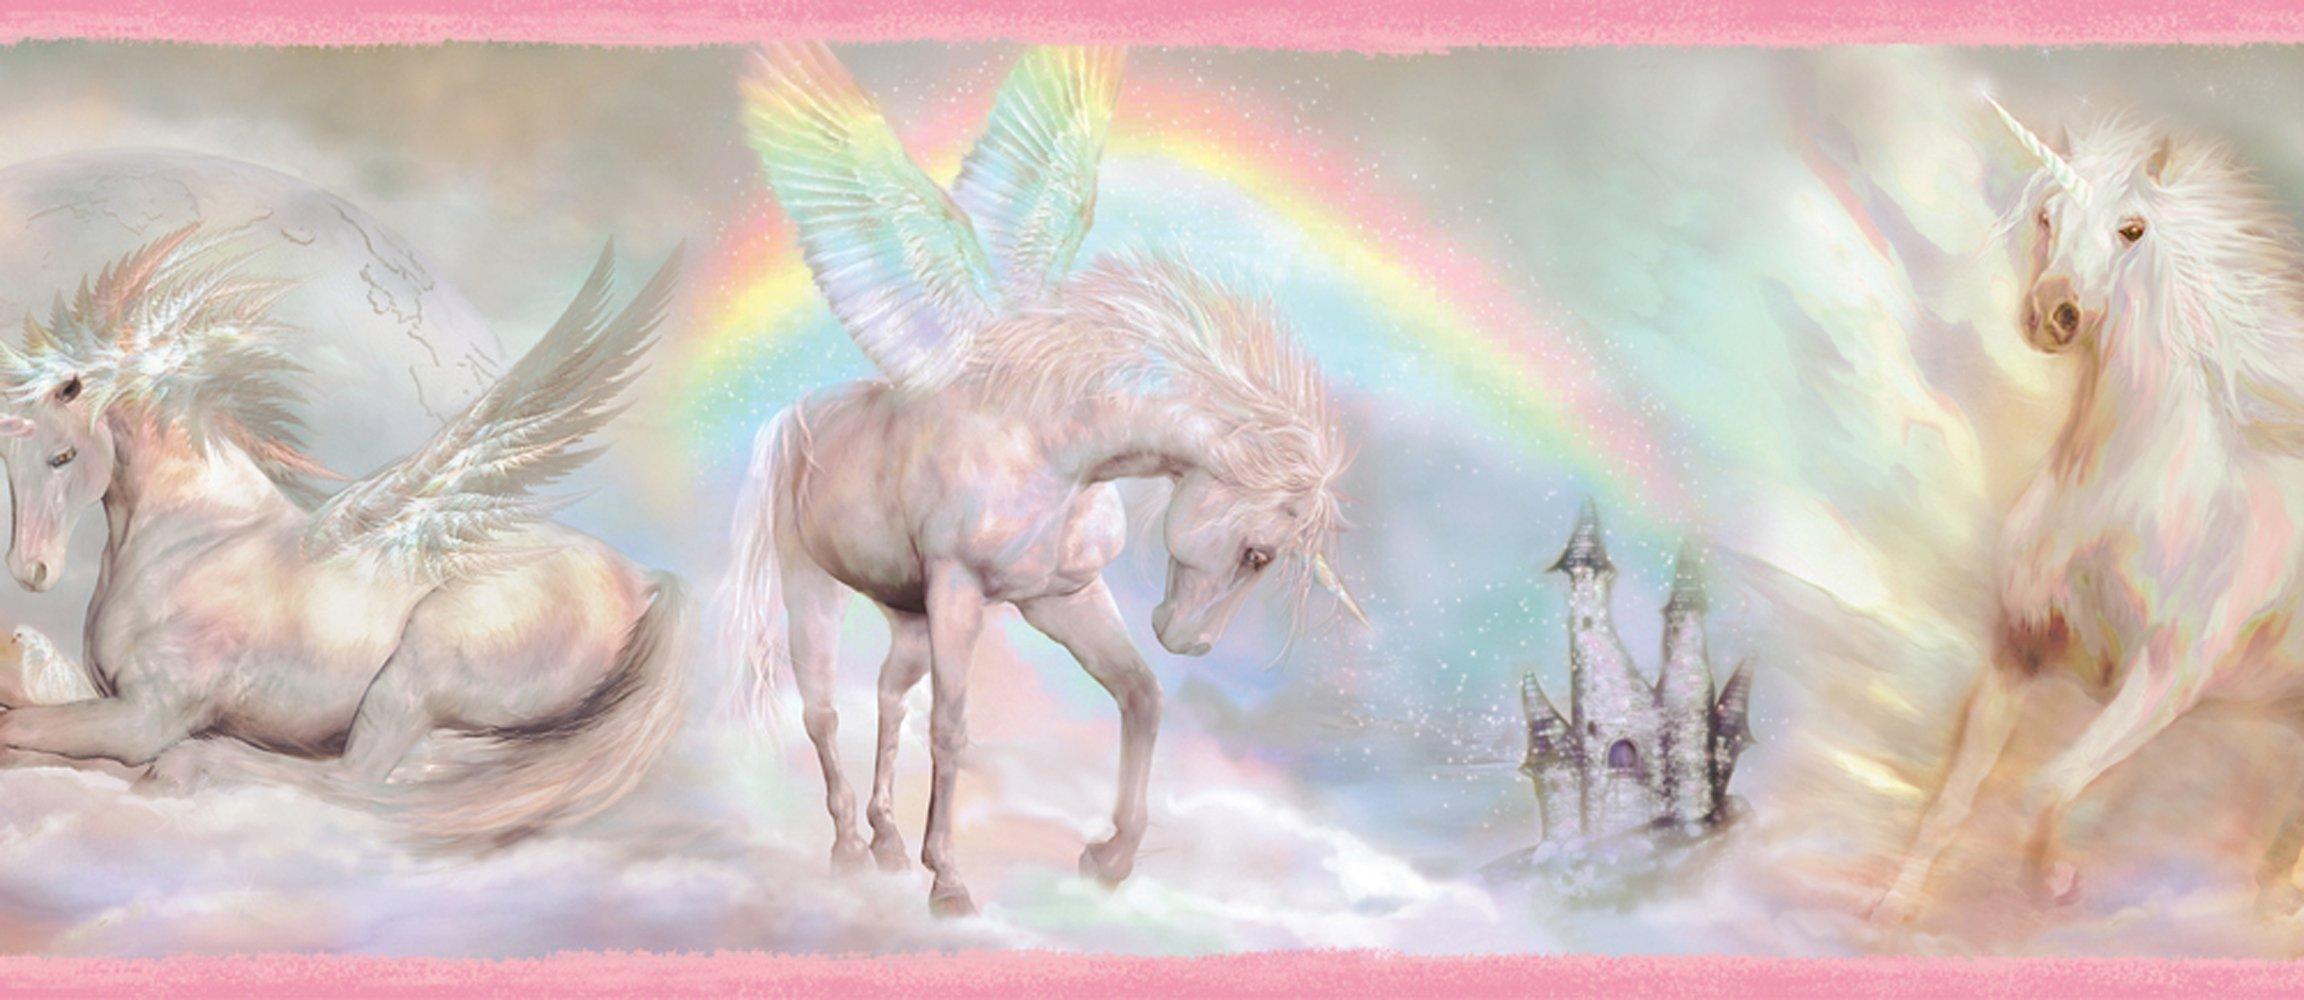 Chesapeake TOT46441B Farewell Pink Unicorn Dreams Portrait Wallpaper Border